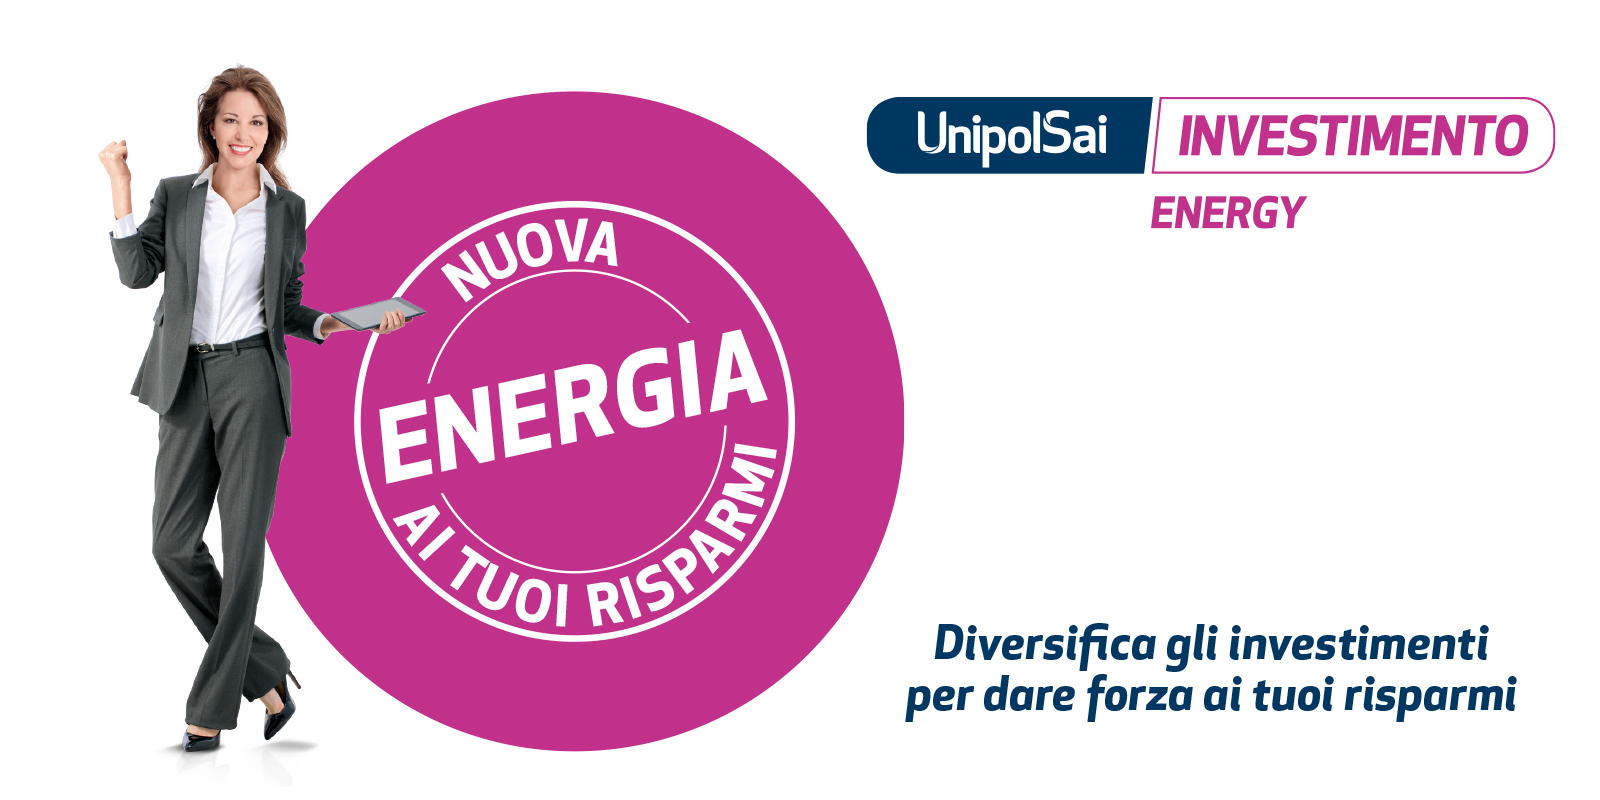 UnipolSai-INVESTIMENTO-Energy